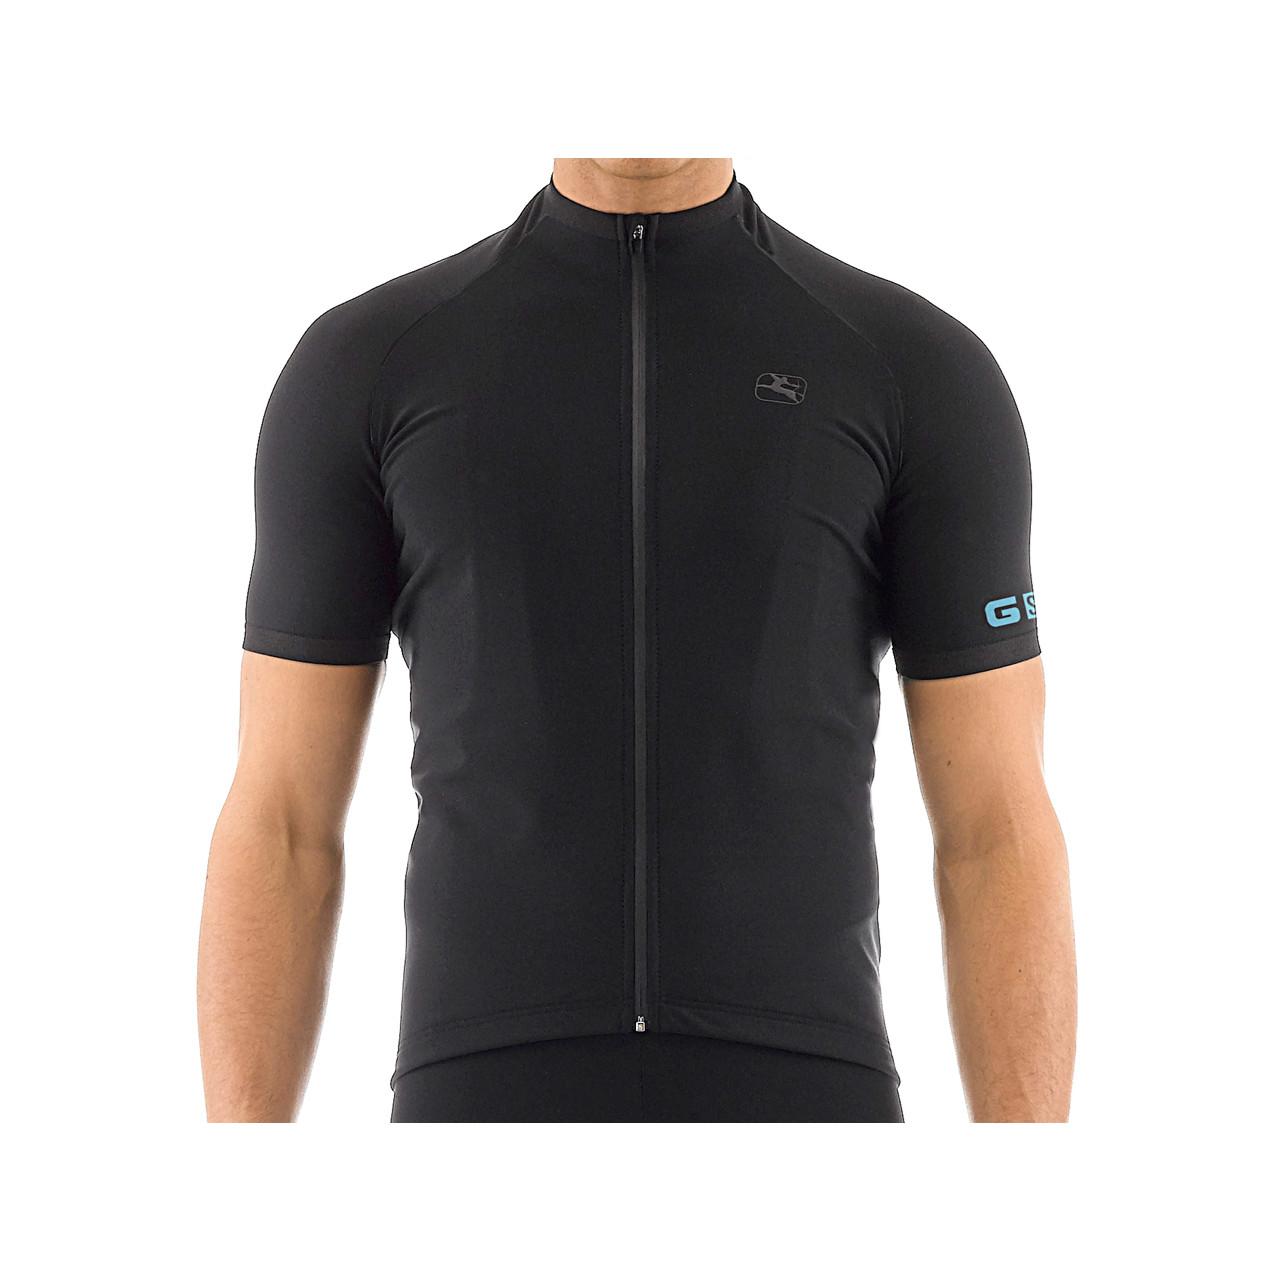 Cykler Giordana Jersey G-Shield Kortærmet (Sort, L) Cykel Tilbehør